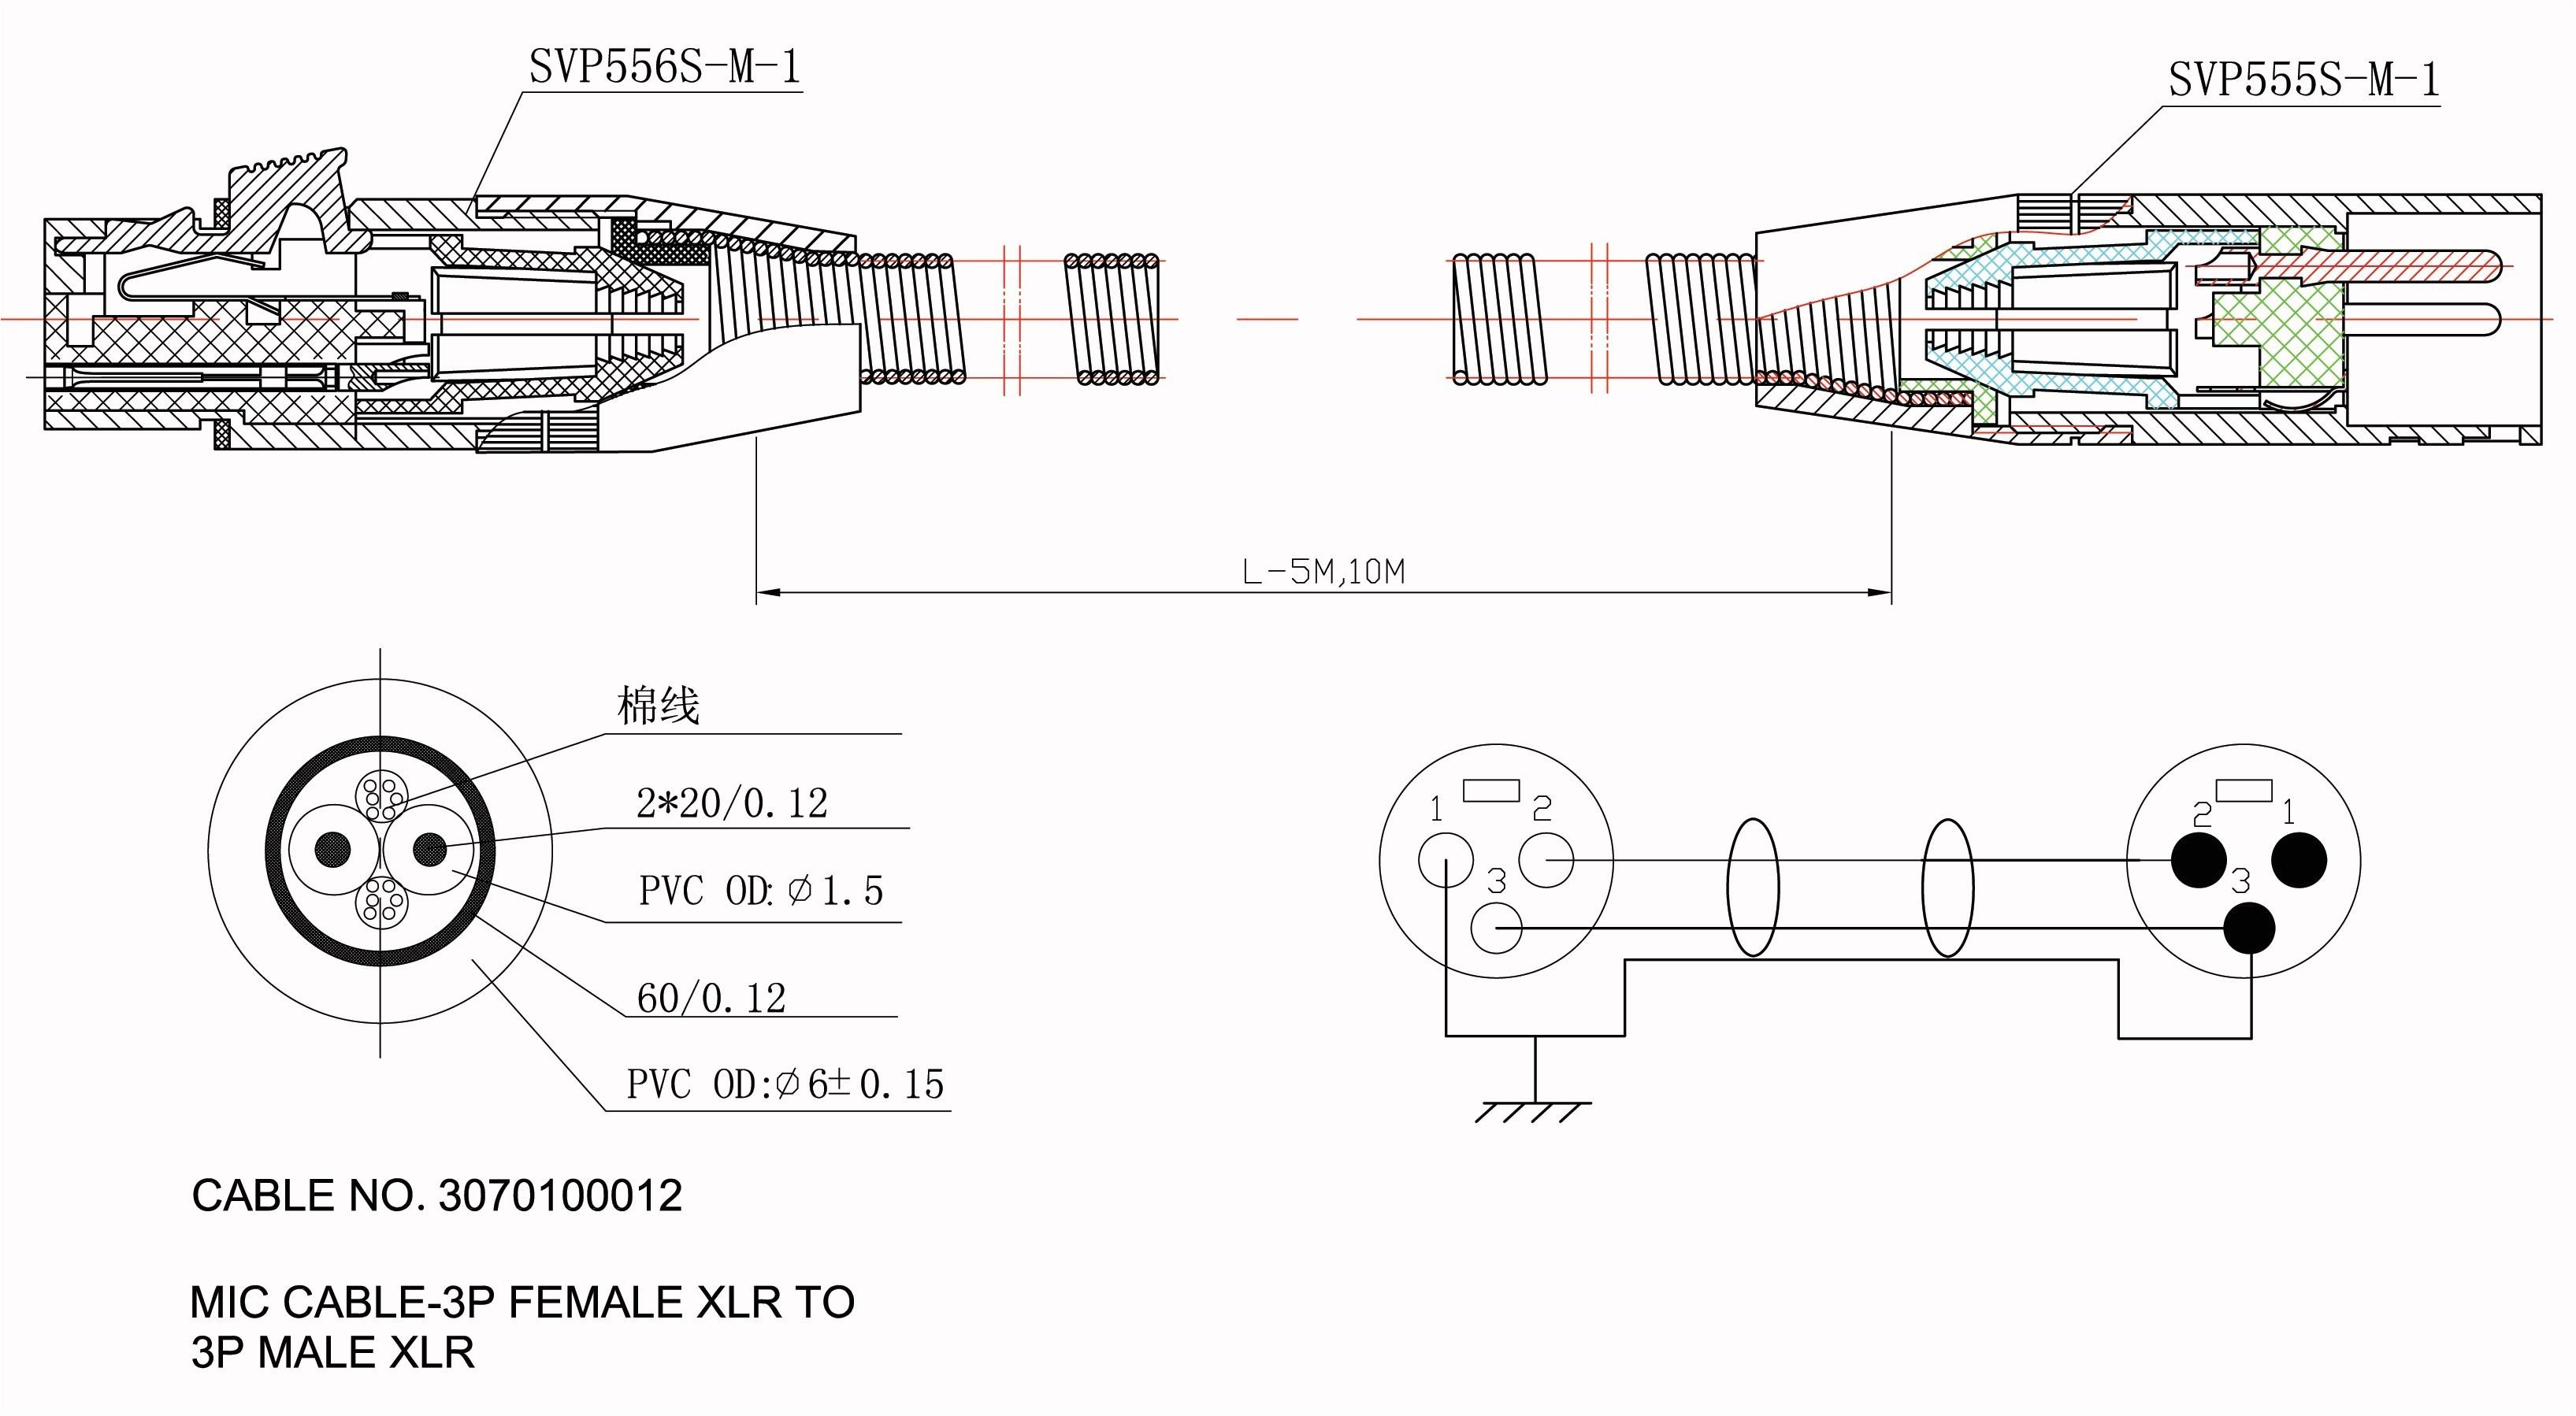 light wiring diagram delco wiring diagram paperdelco 2700 wiring diagram wiring diagram datasource light bar wiring